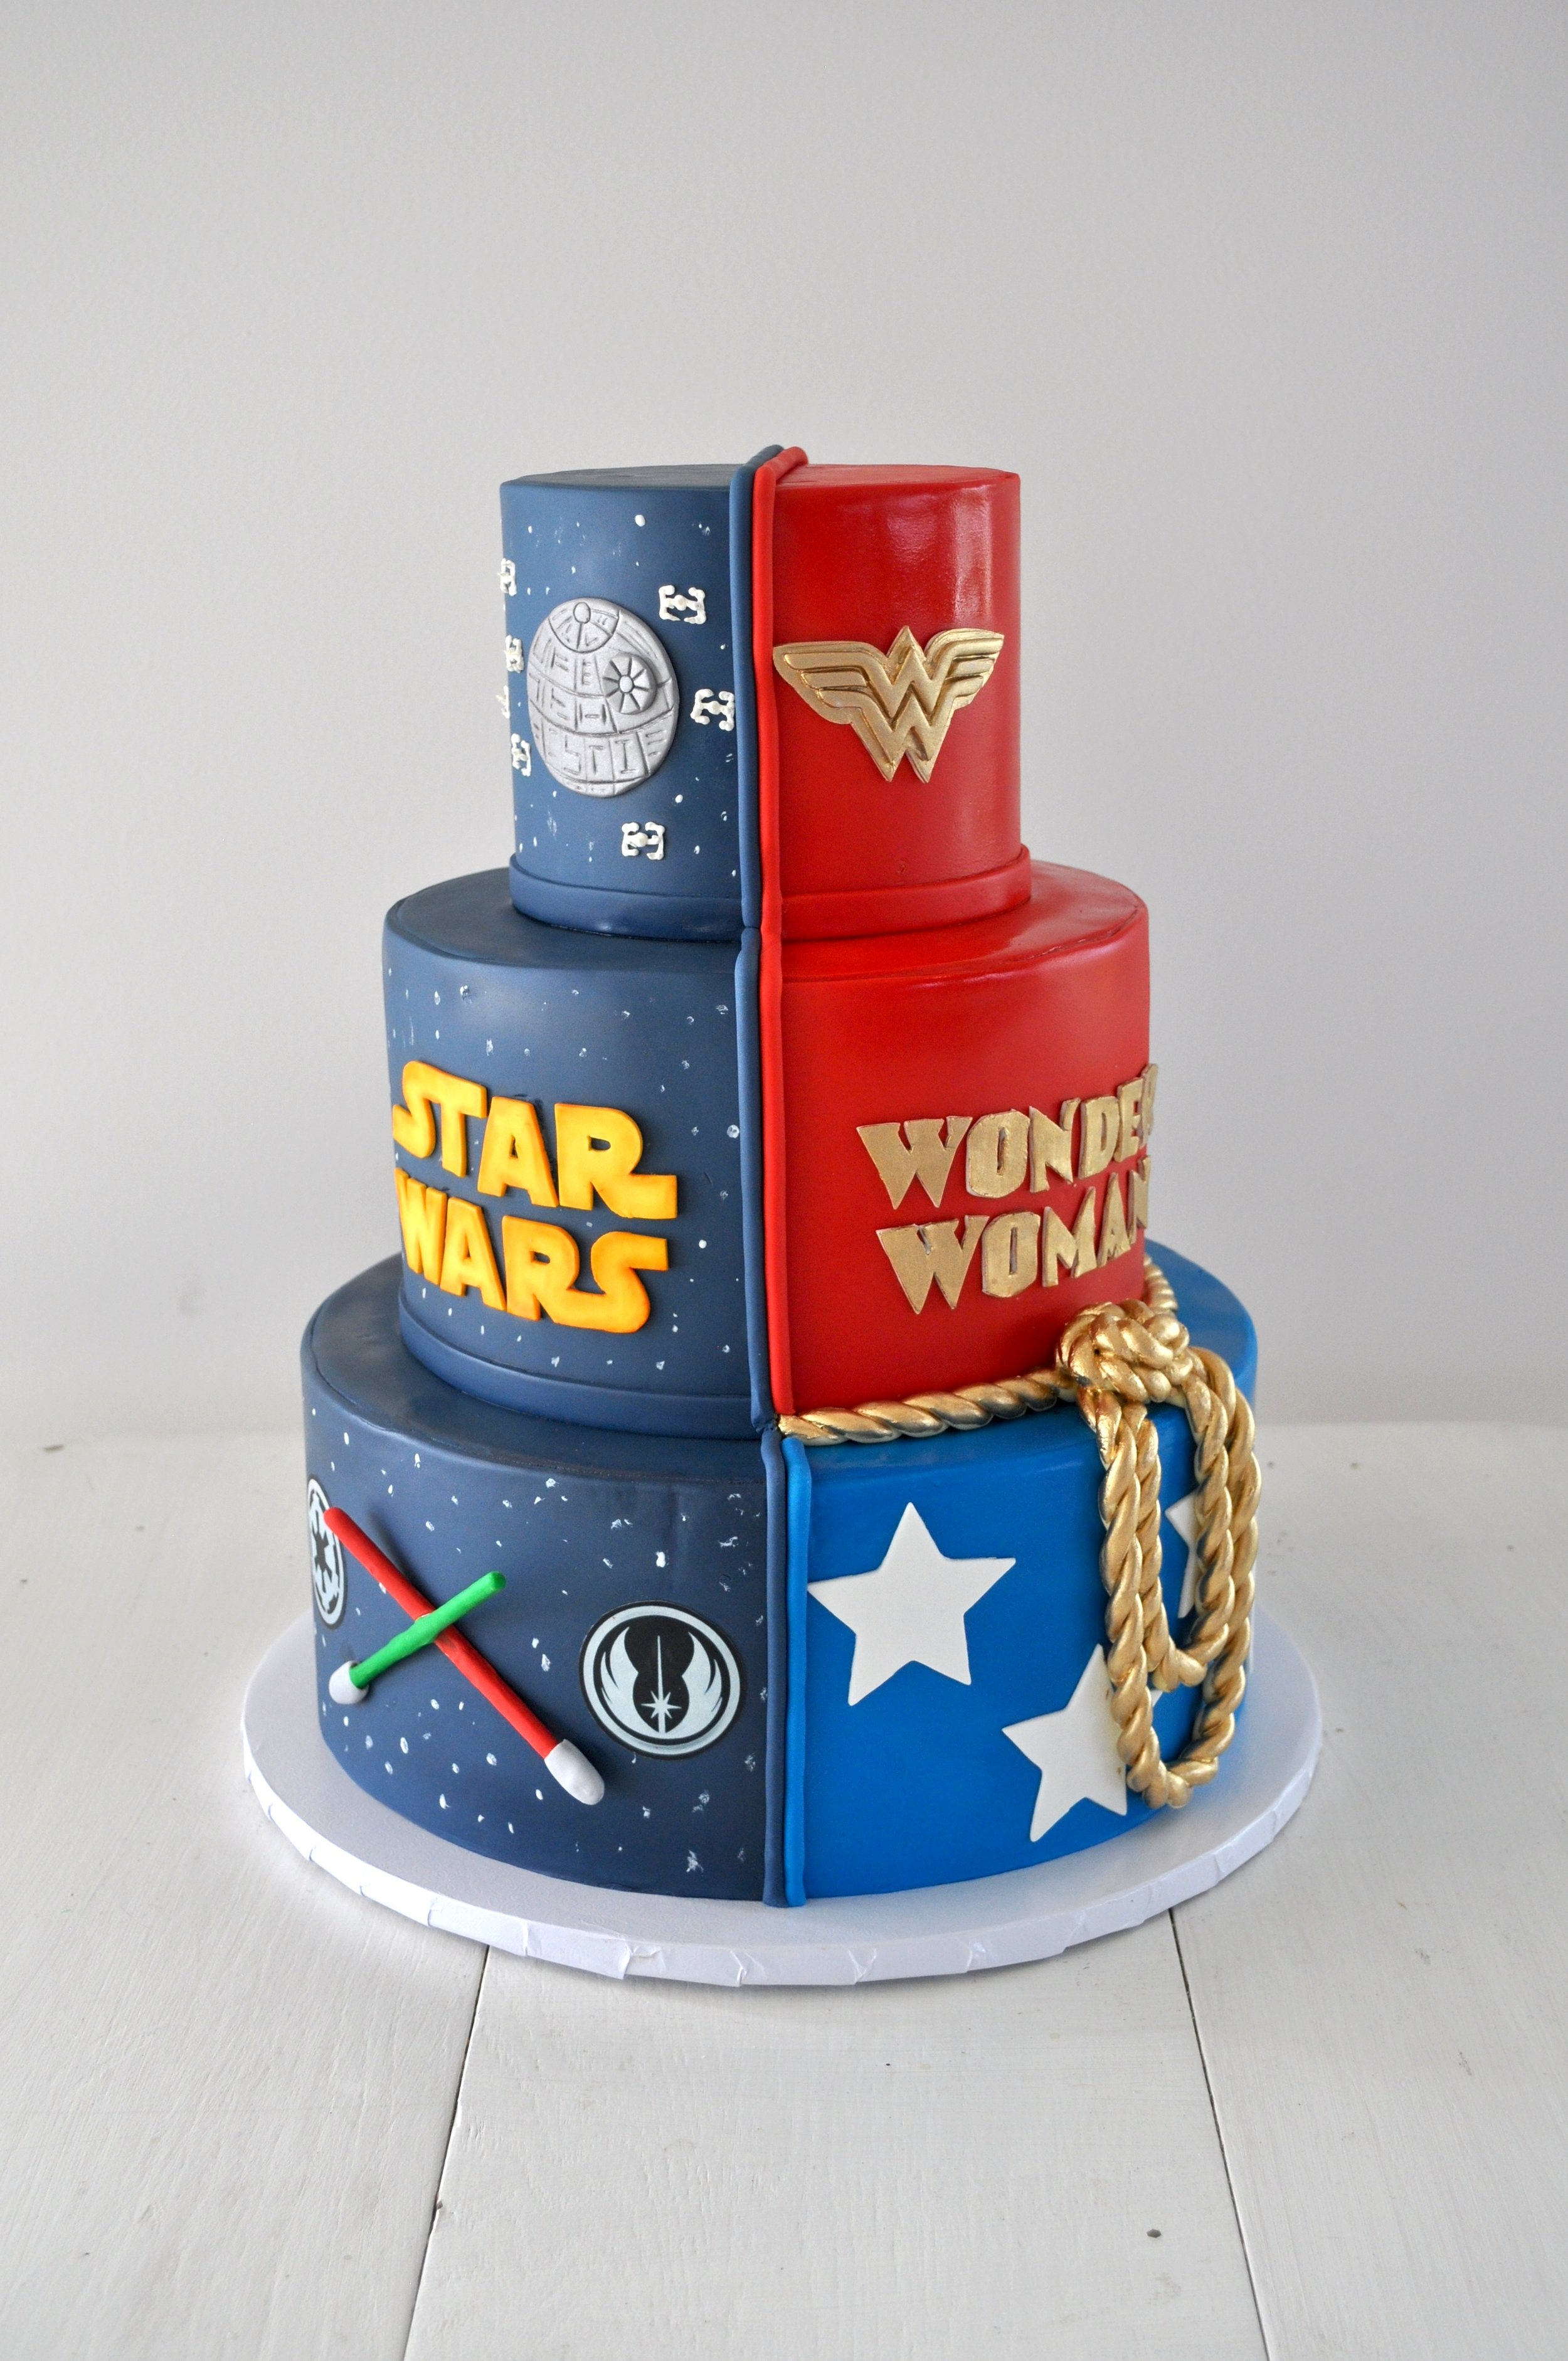 custom-cake-starwars-wonderwoman-sugarbeesweets.jpg